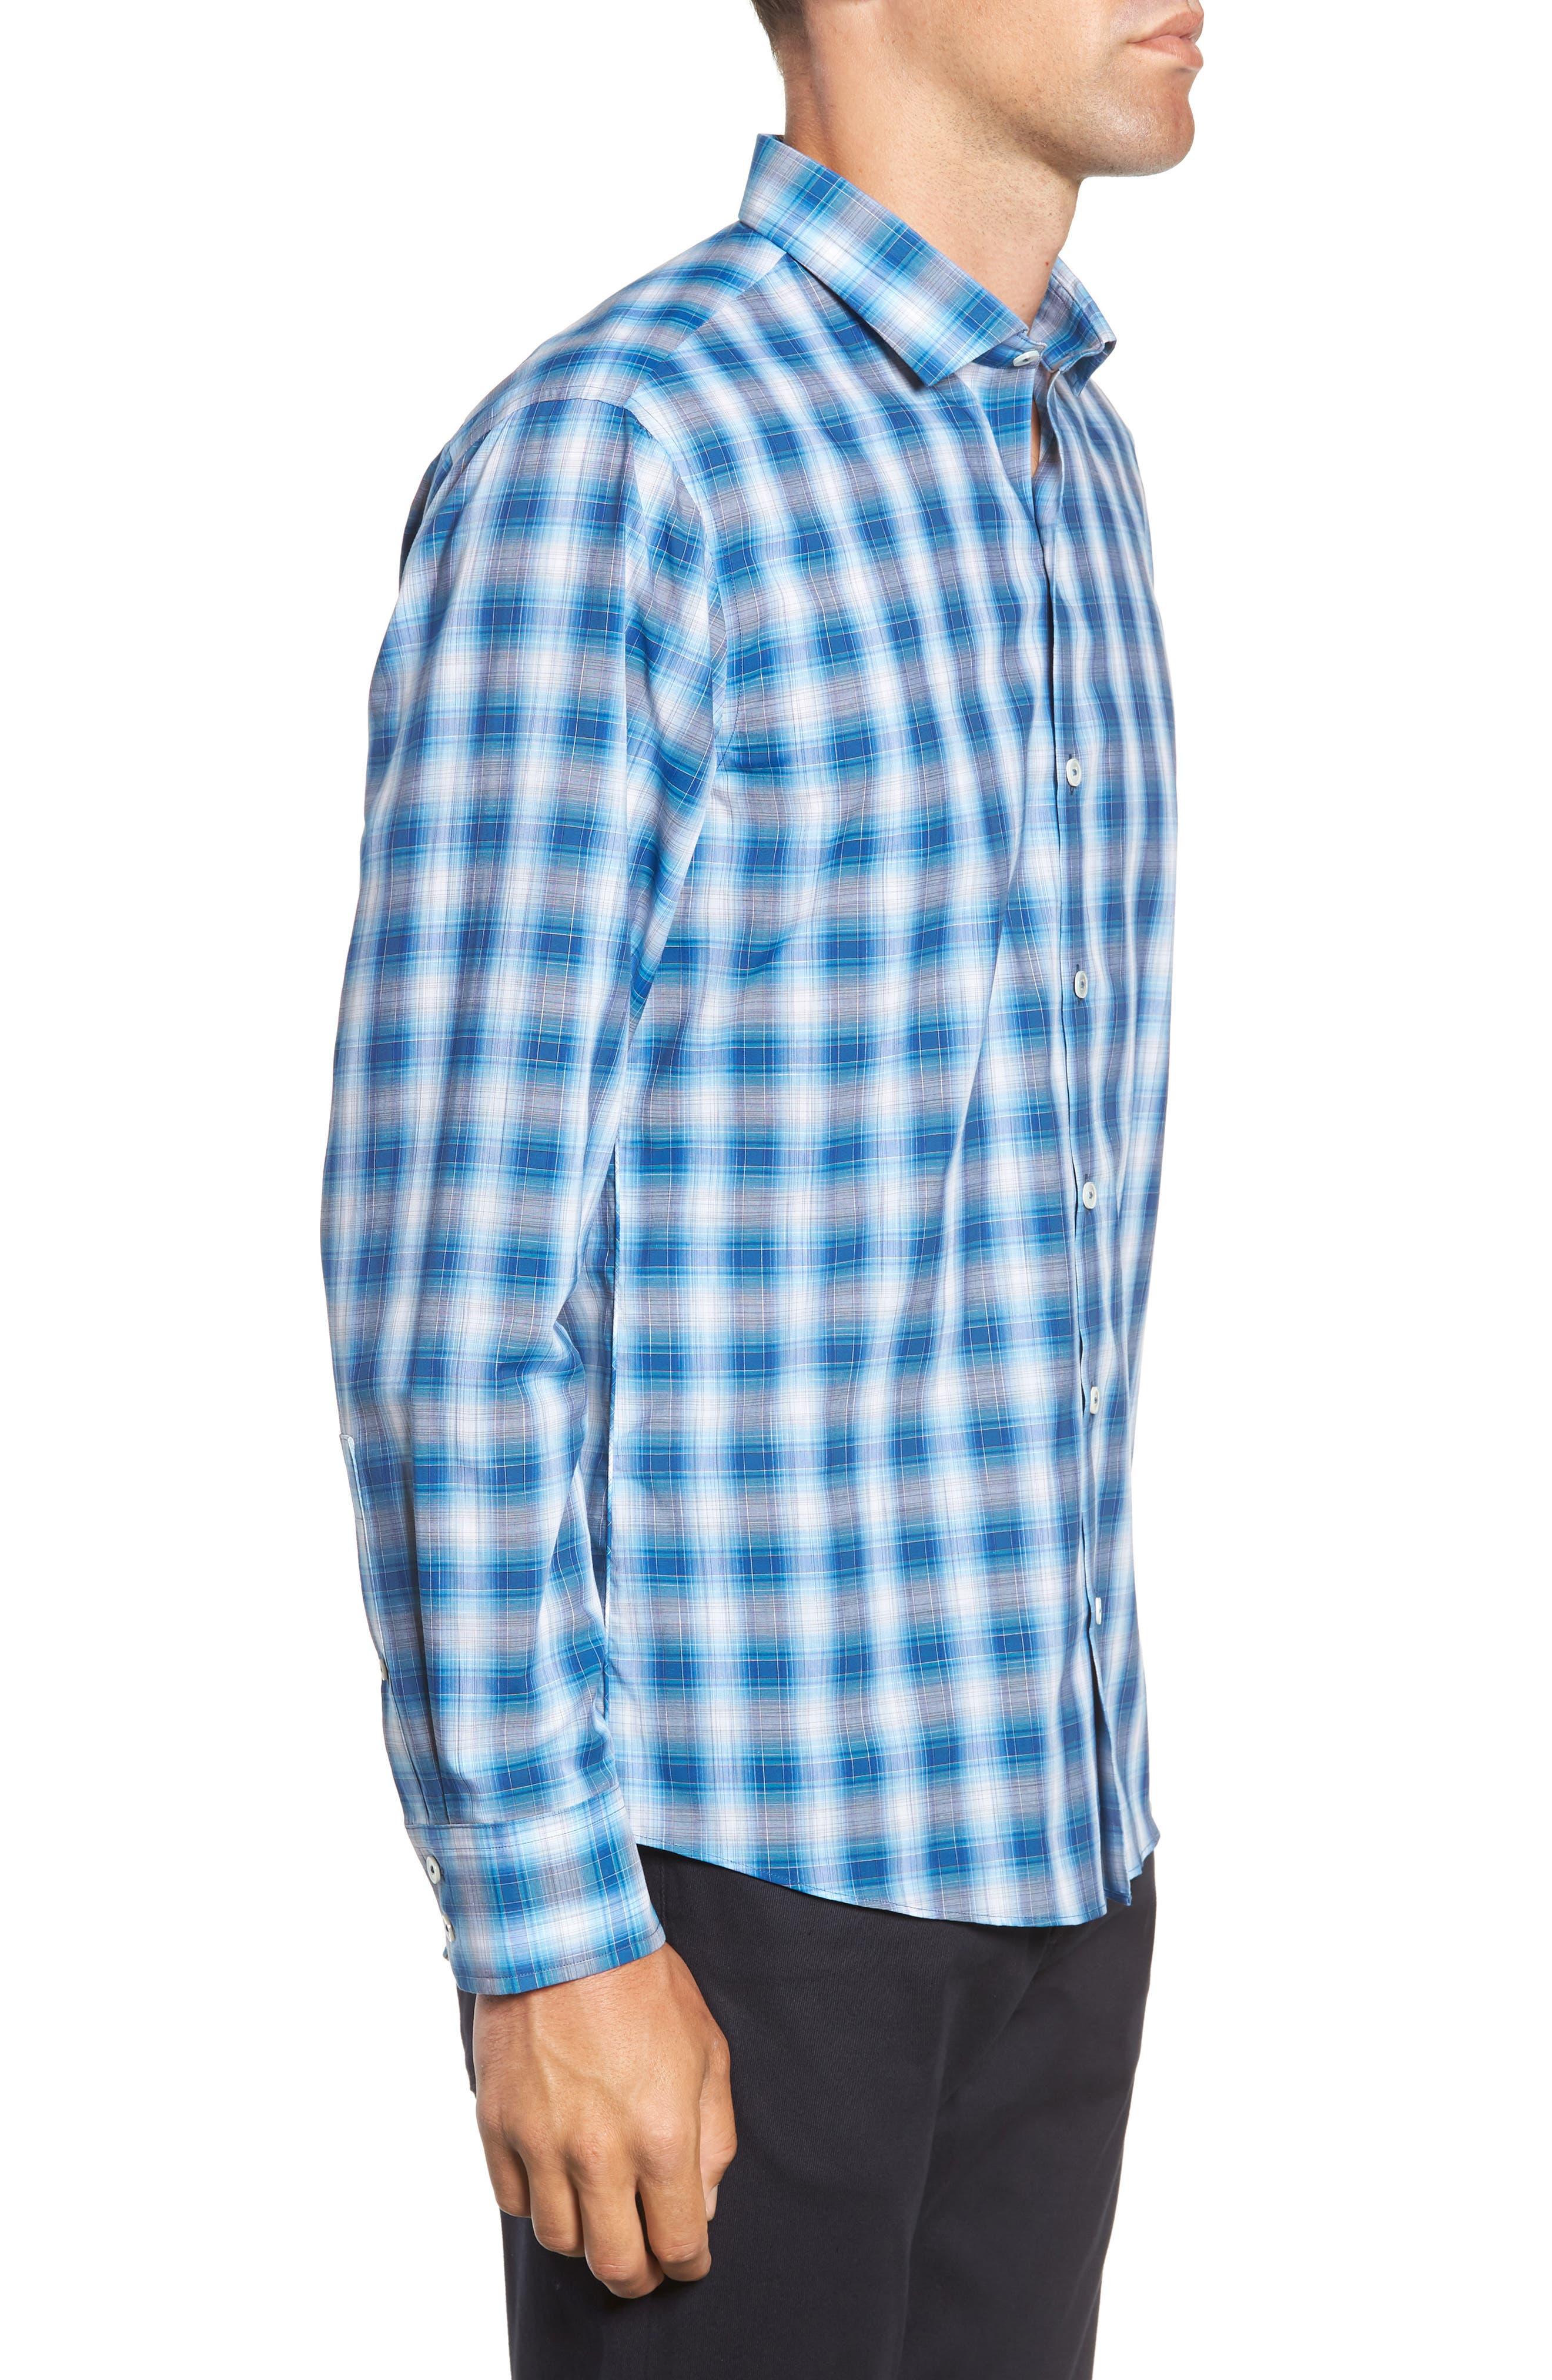 Holtsinger Plaid Sport Shirt,                             Alternate thumbnail 4, color,                             BRIGHT BLUE